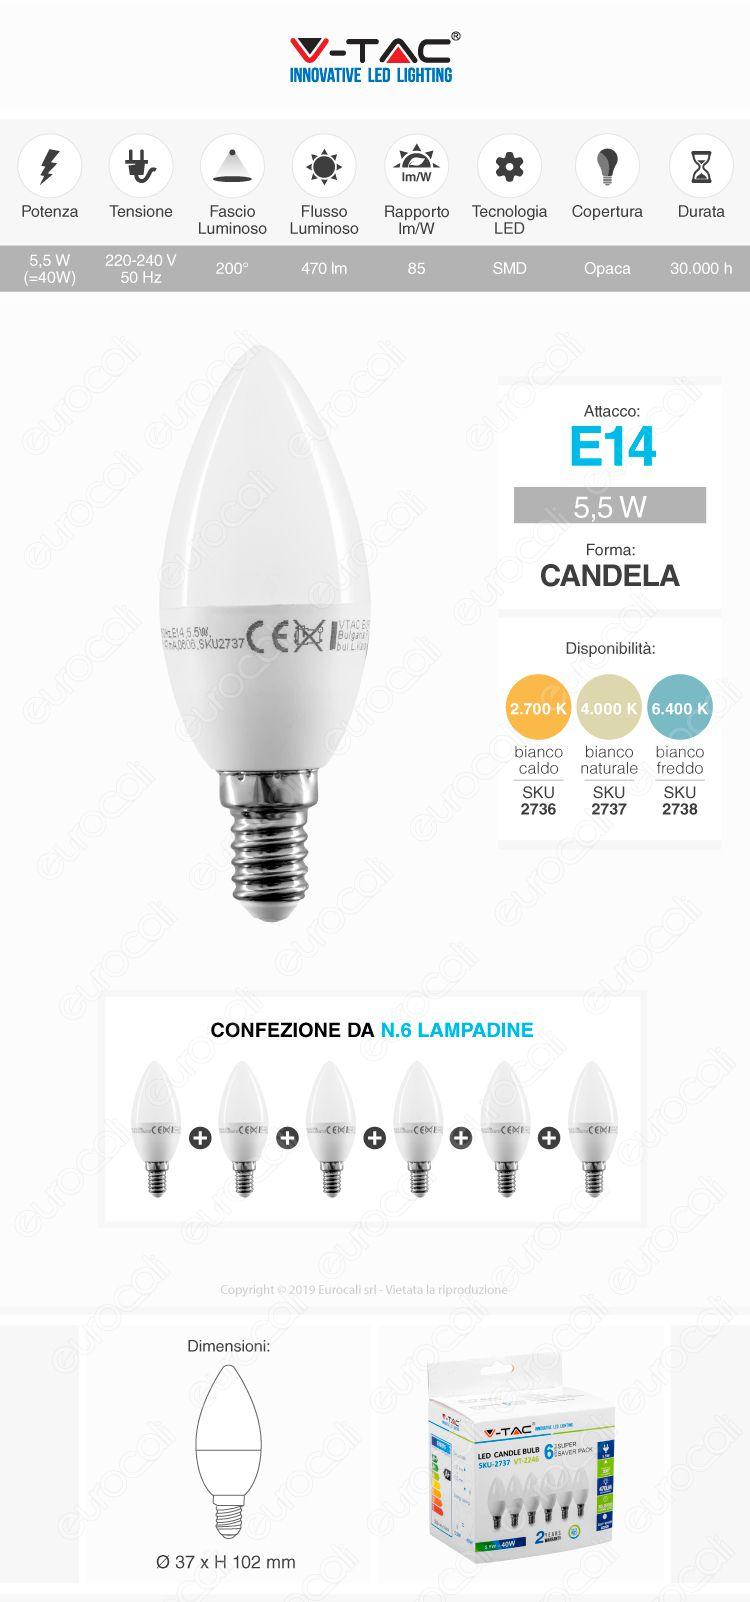 V-Tac VT-2246 Super Saver Pack Confezione 6 Lampadine LED E14 5,5W Candel